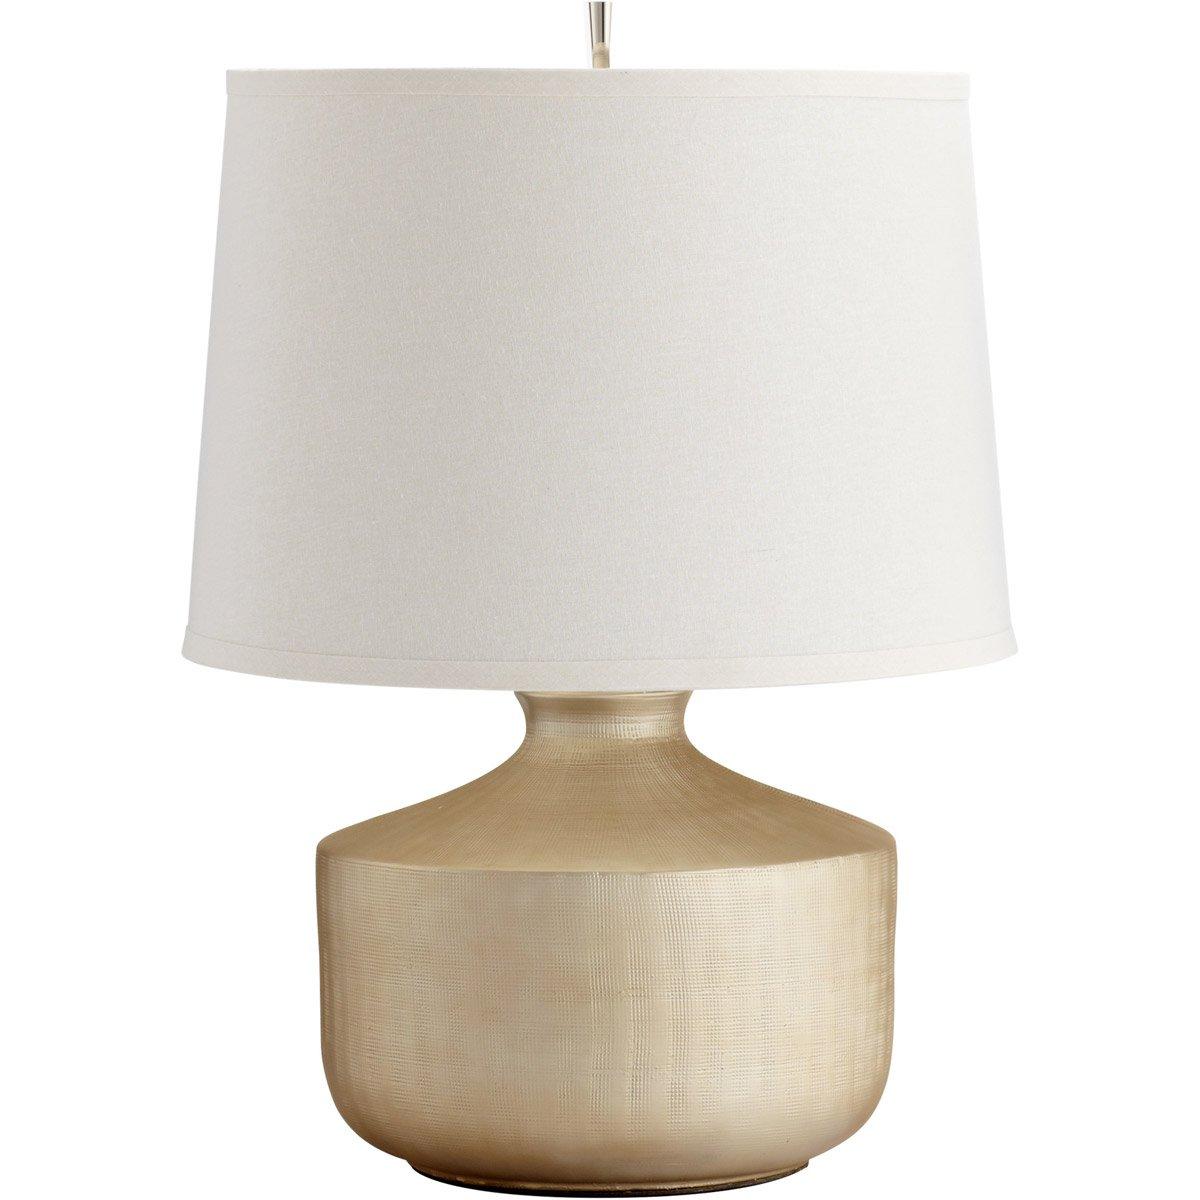 Cyan Design 05893 Titanium Love Table Lamp in Silver,